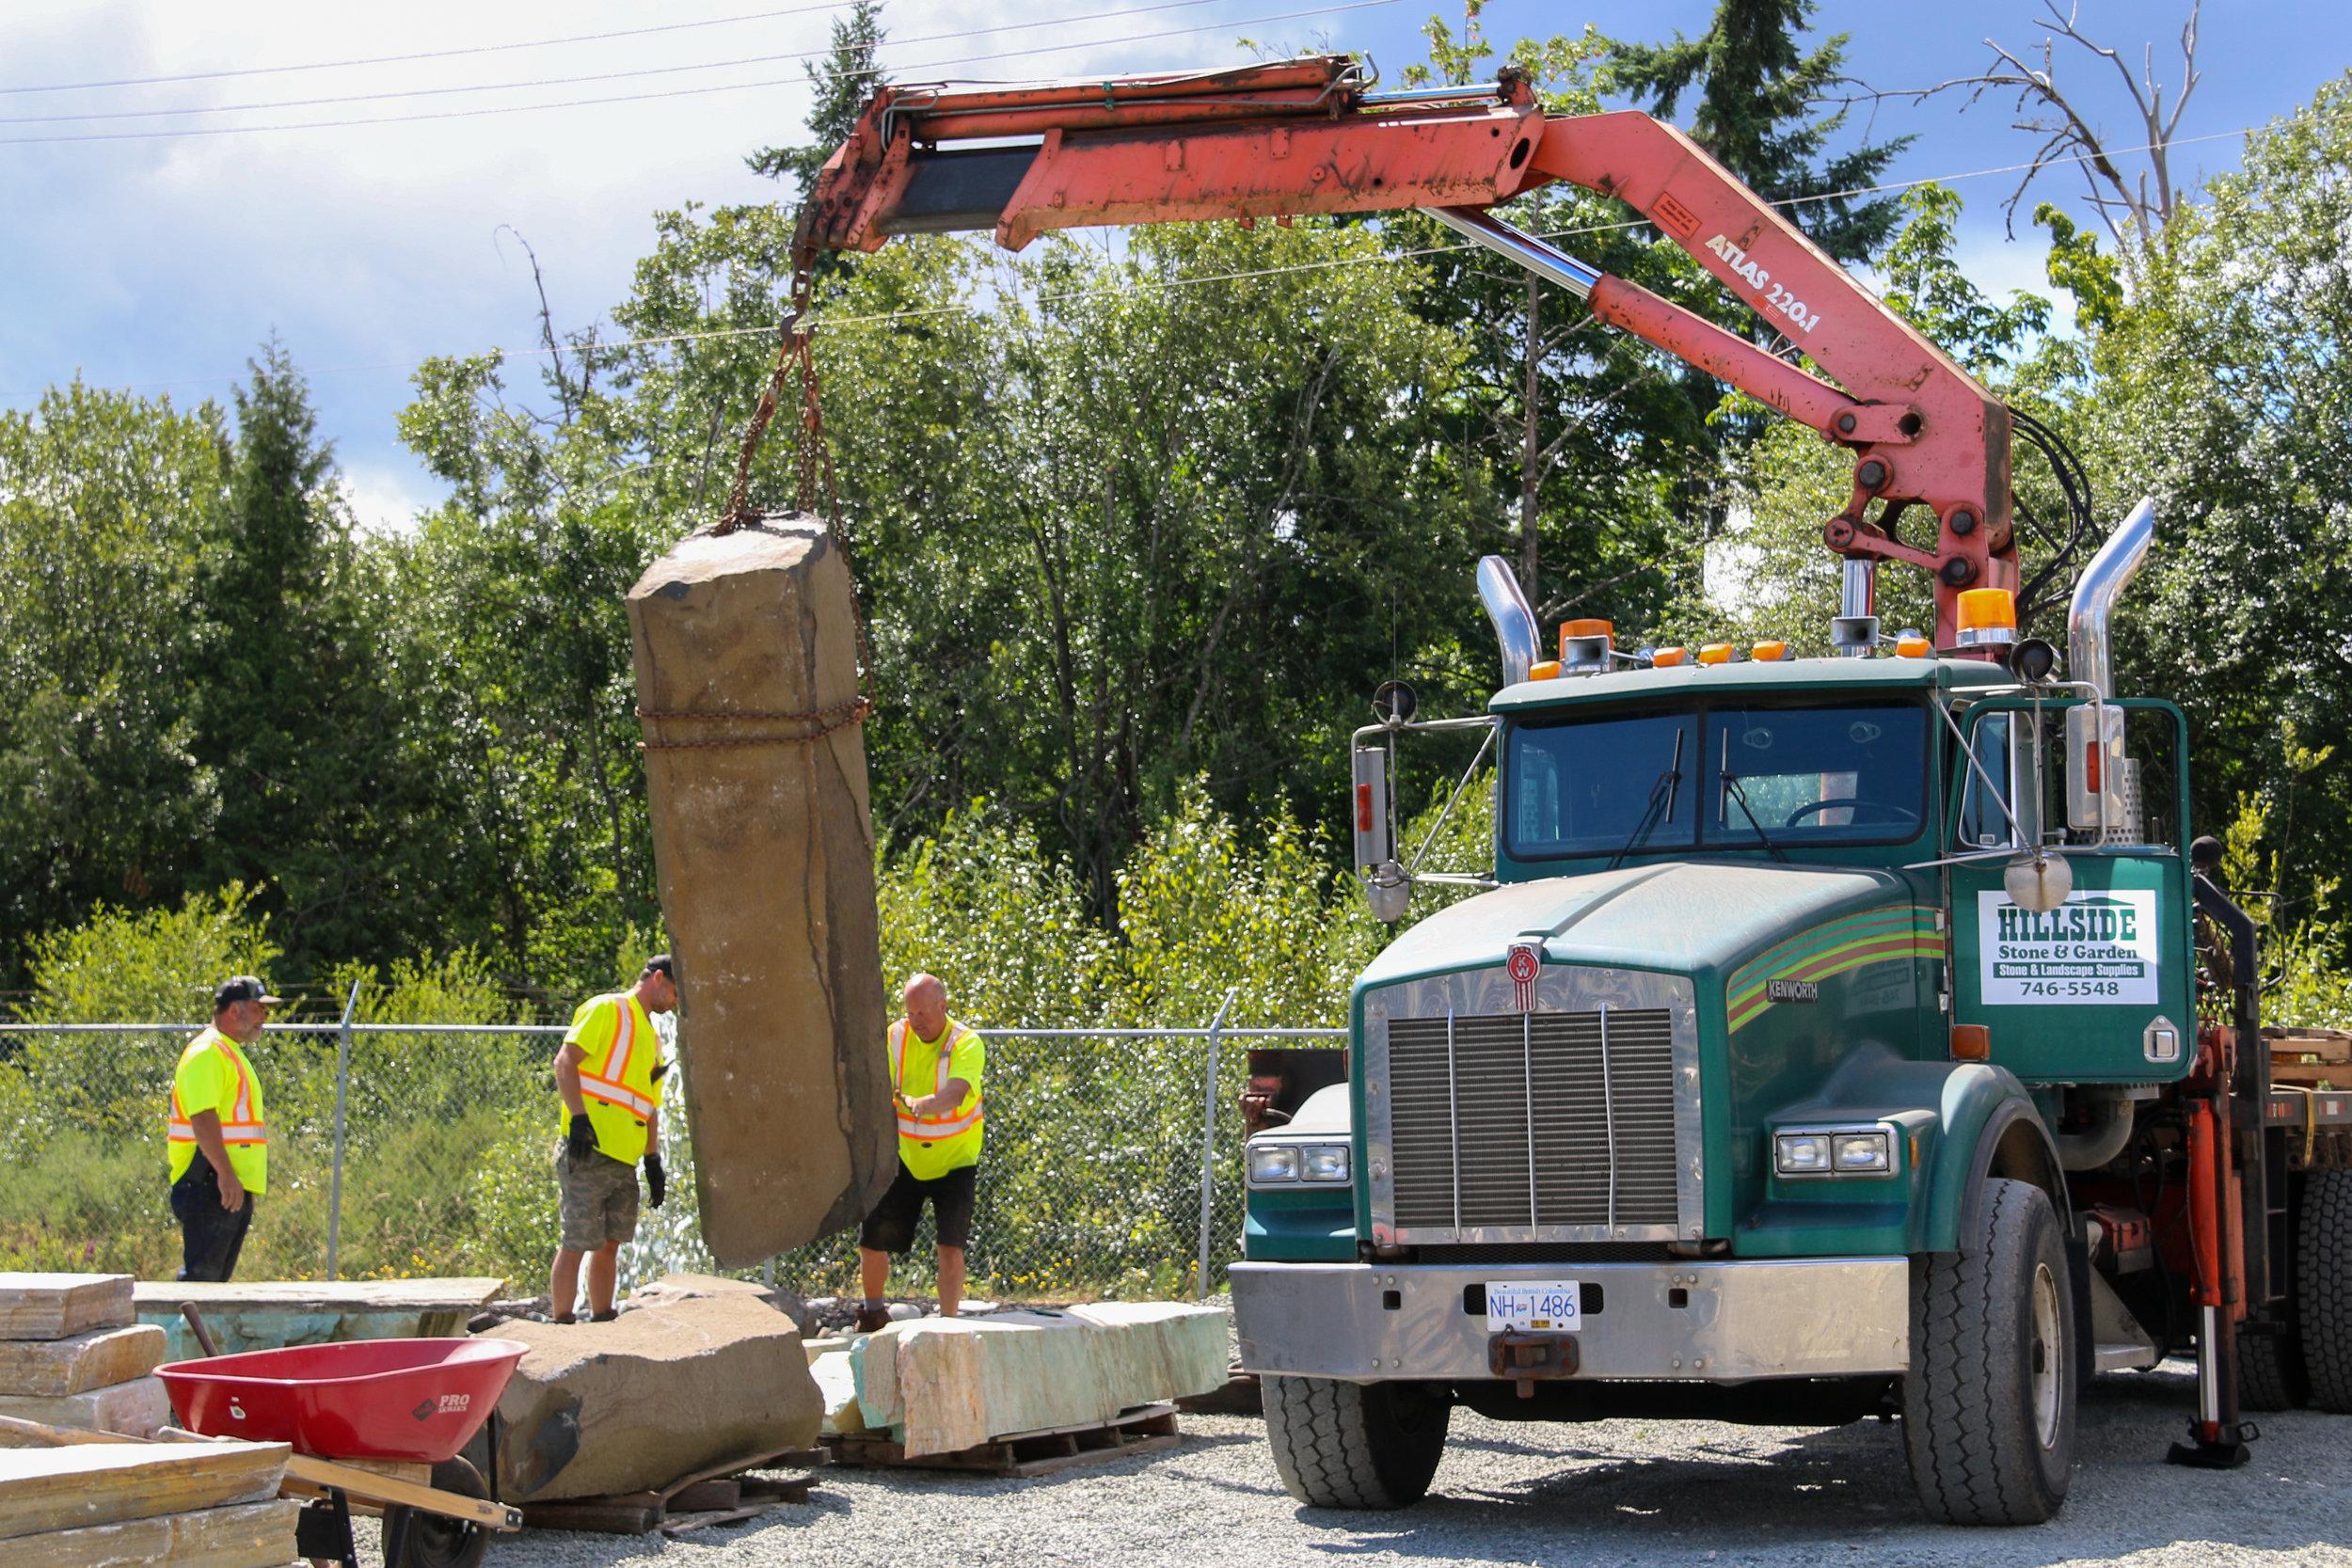 Crane Truck Delivery Hillside Stone and Garden